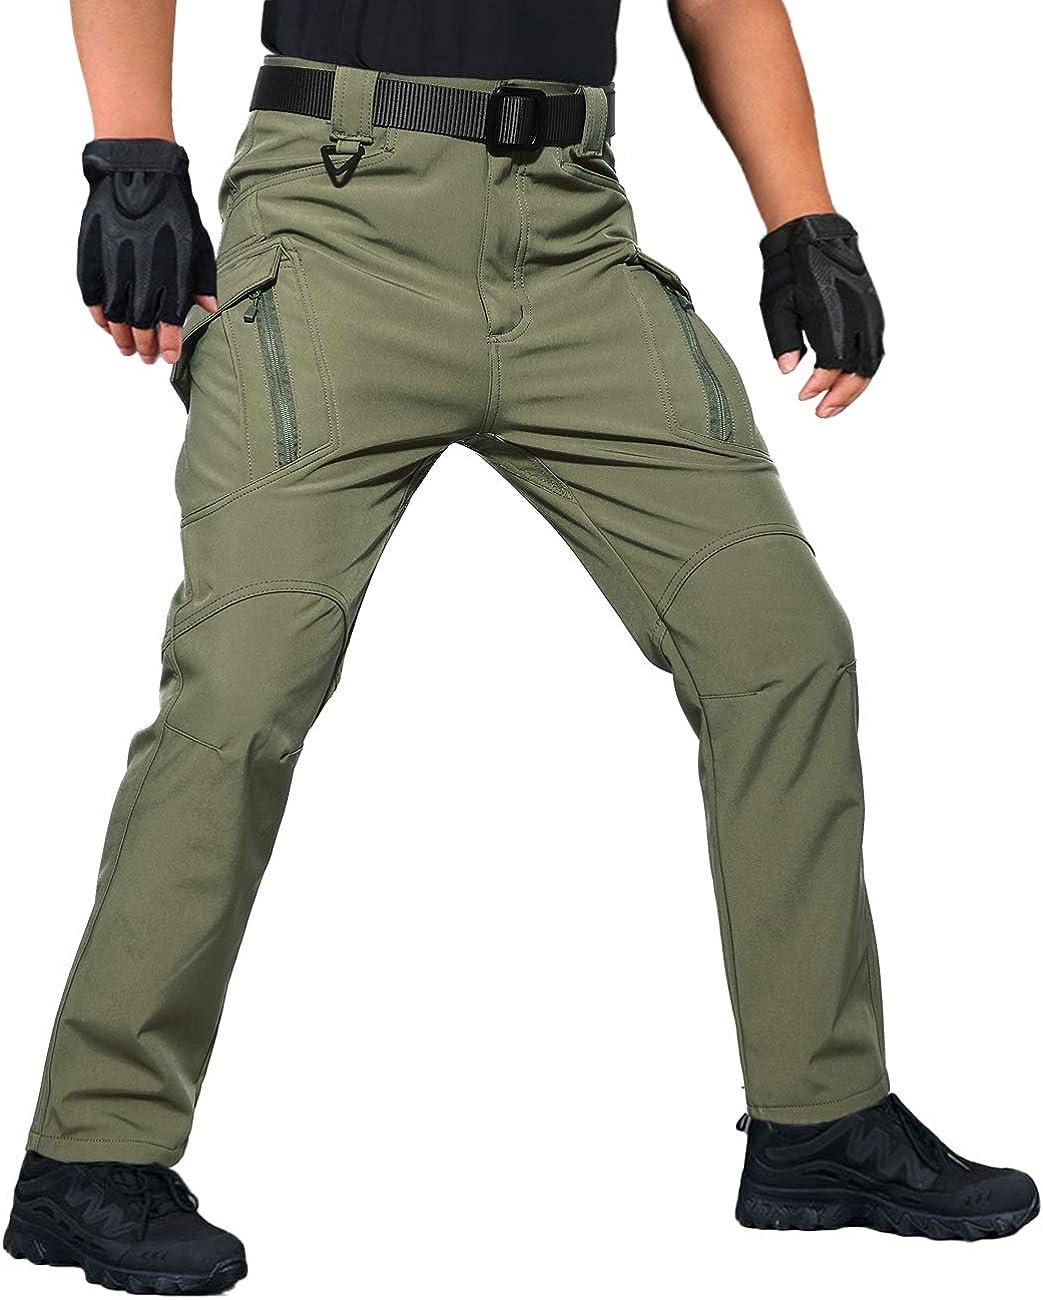 Mens Thick Fleece Thermal Trousers Tactical Waterproof Outdoor Combat Work Pants